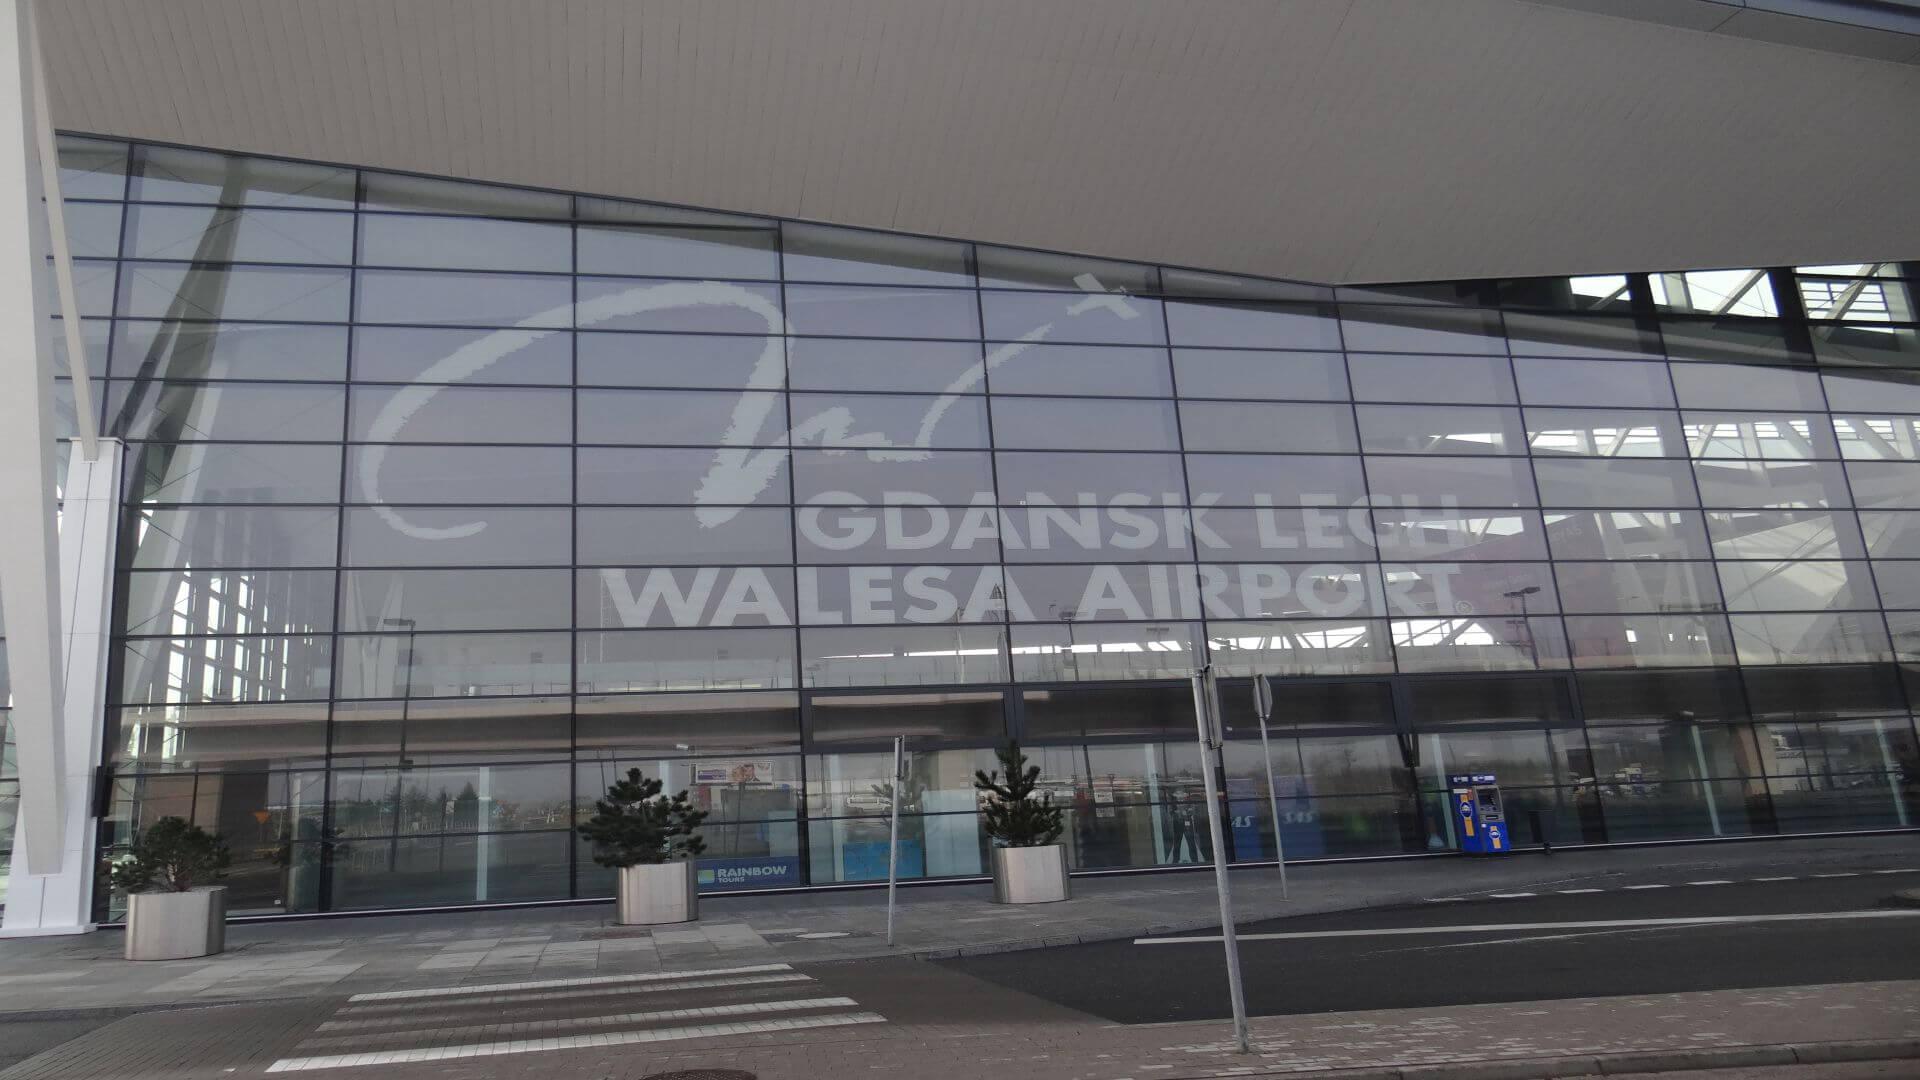 The new terminal of Gdańsk Lech Wałęsa airport, Terminal 2.